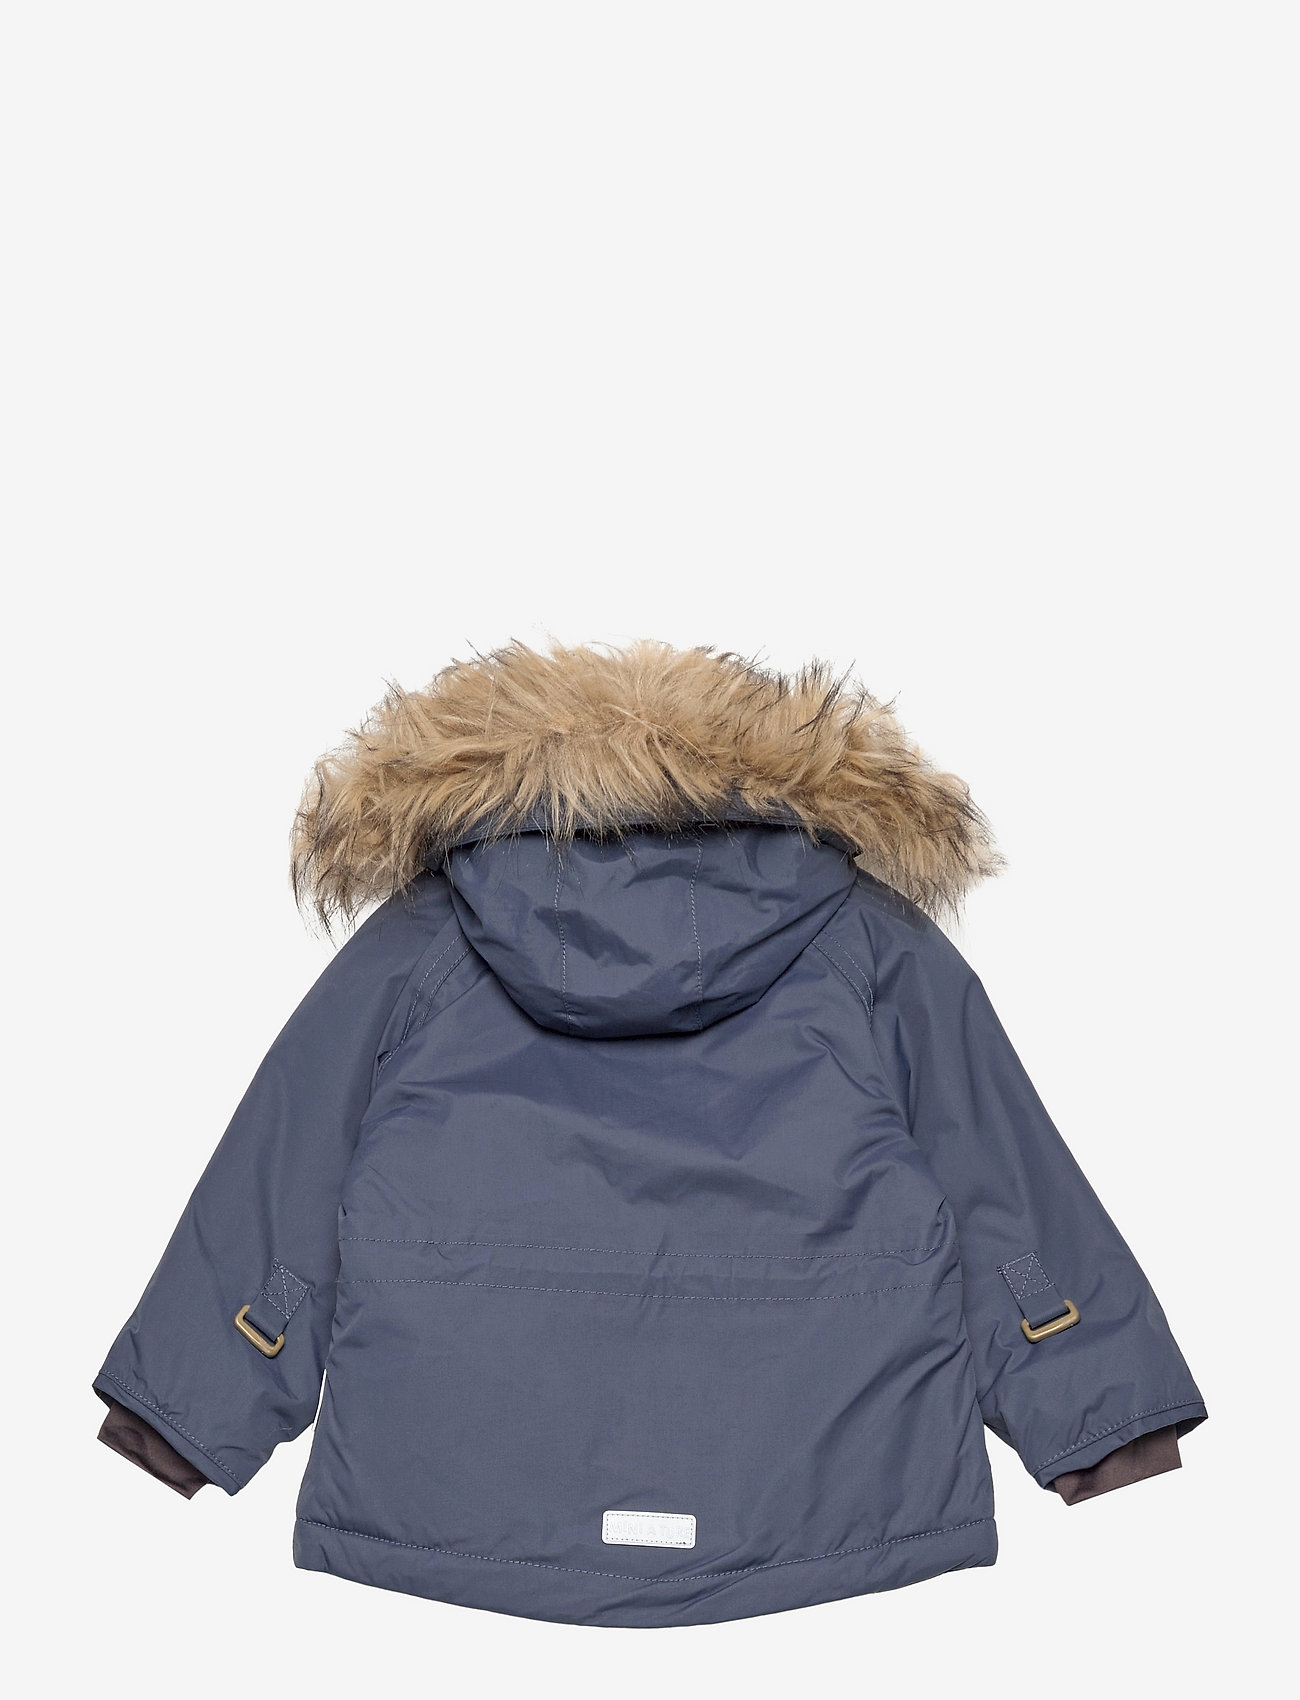 Mini A Ture - Wally Fake Fur Jacket, M - winter jacket - blue nights - 1